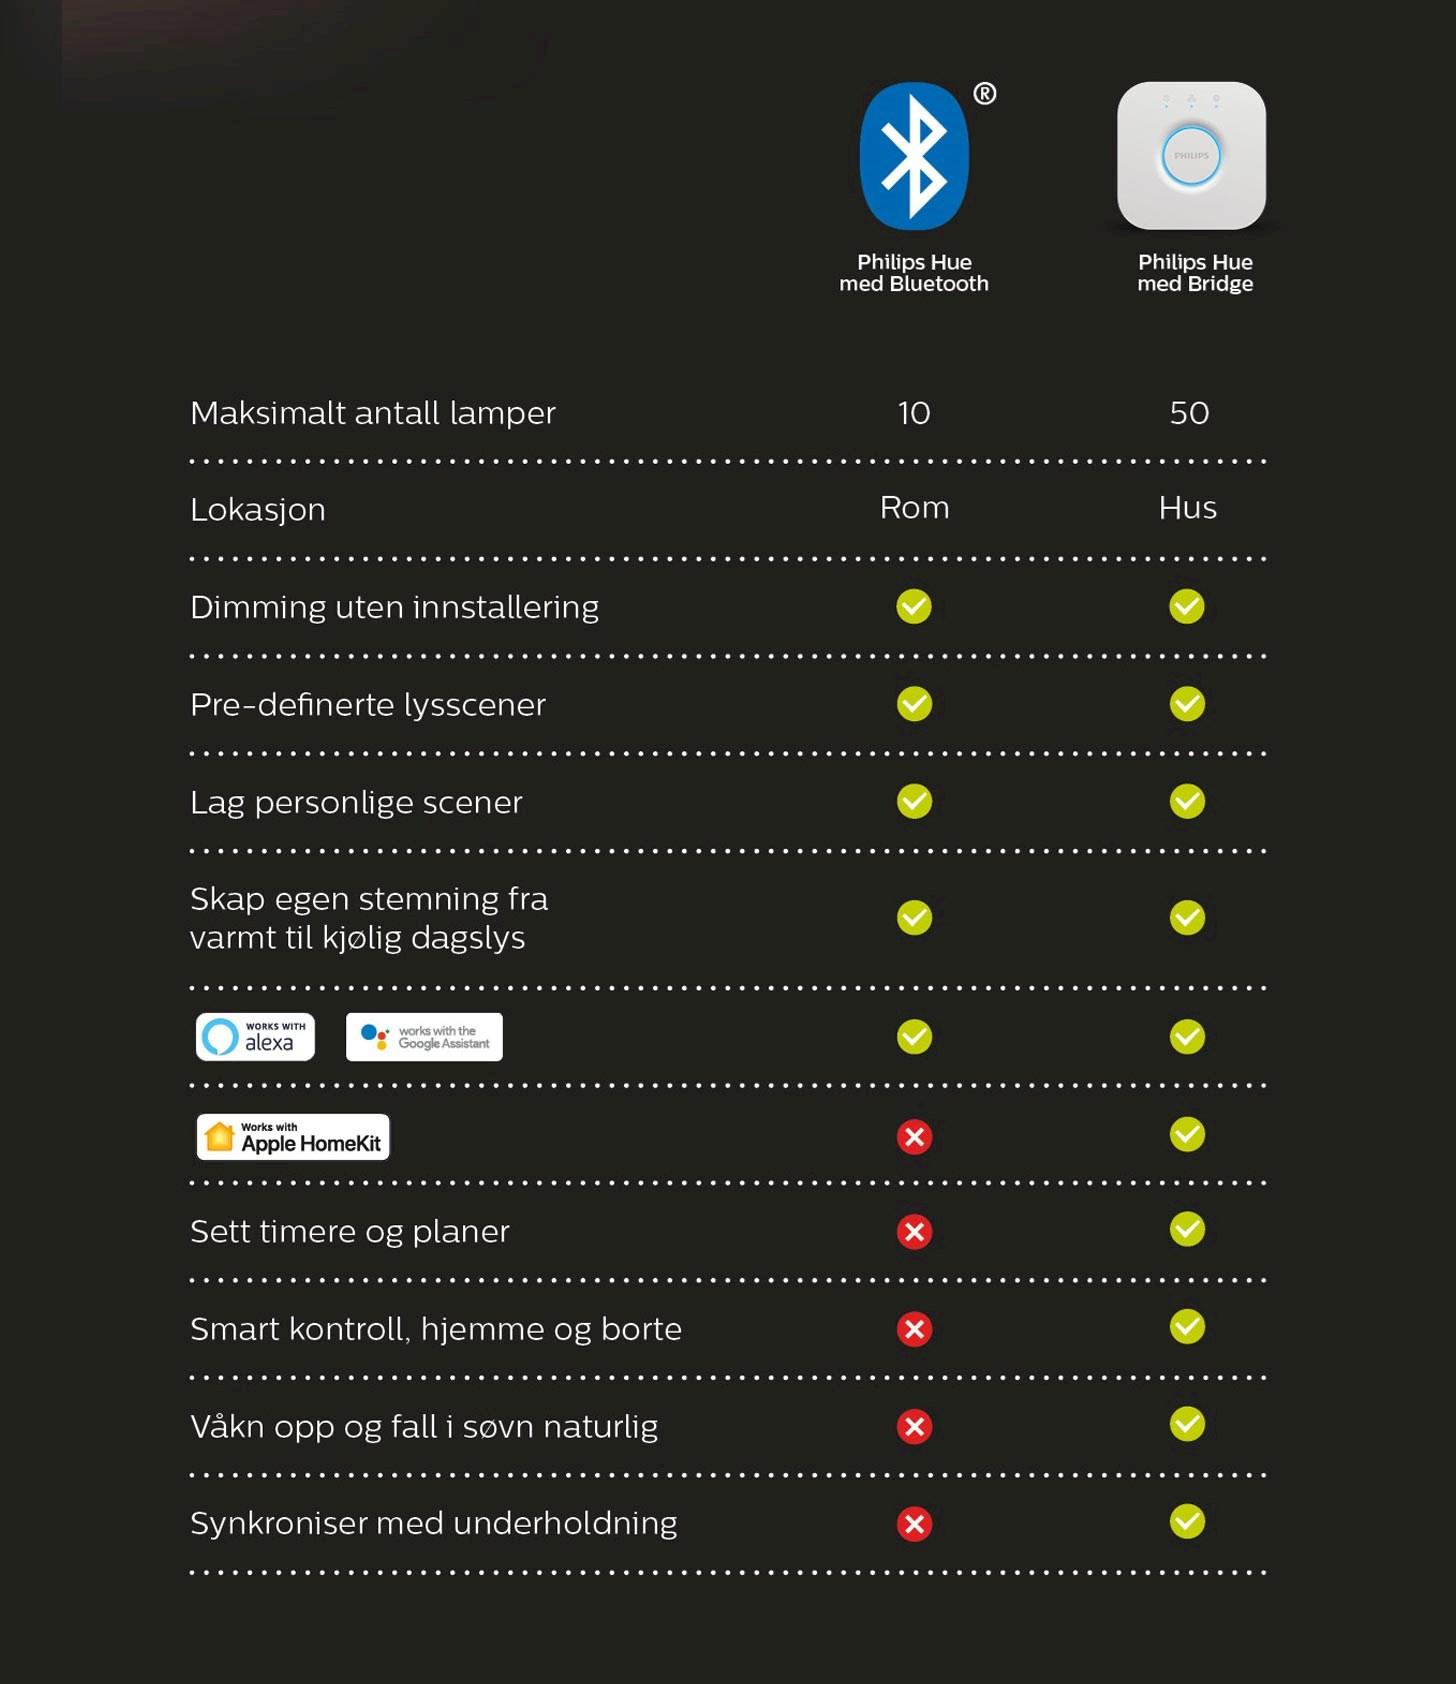 Philips Hue-styring via Bluetooth vs Hue Bridge